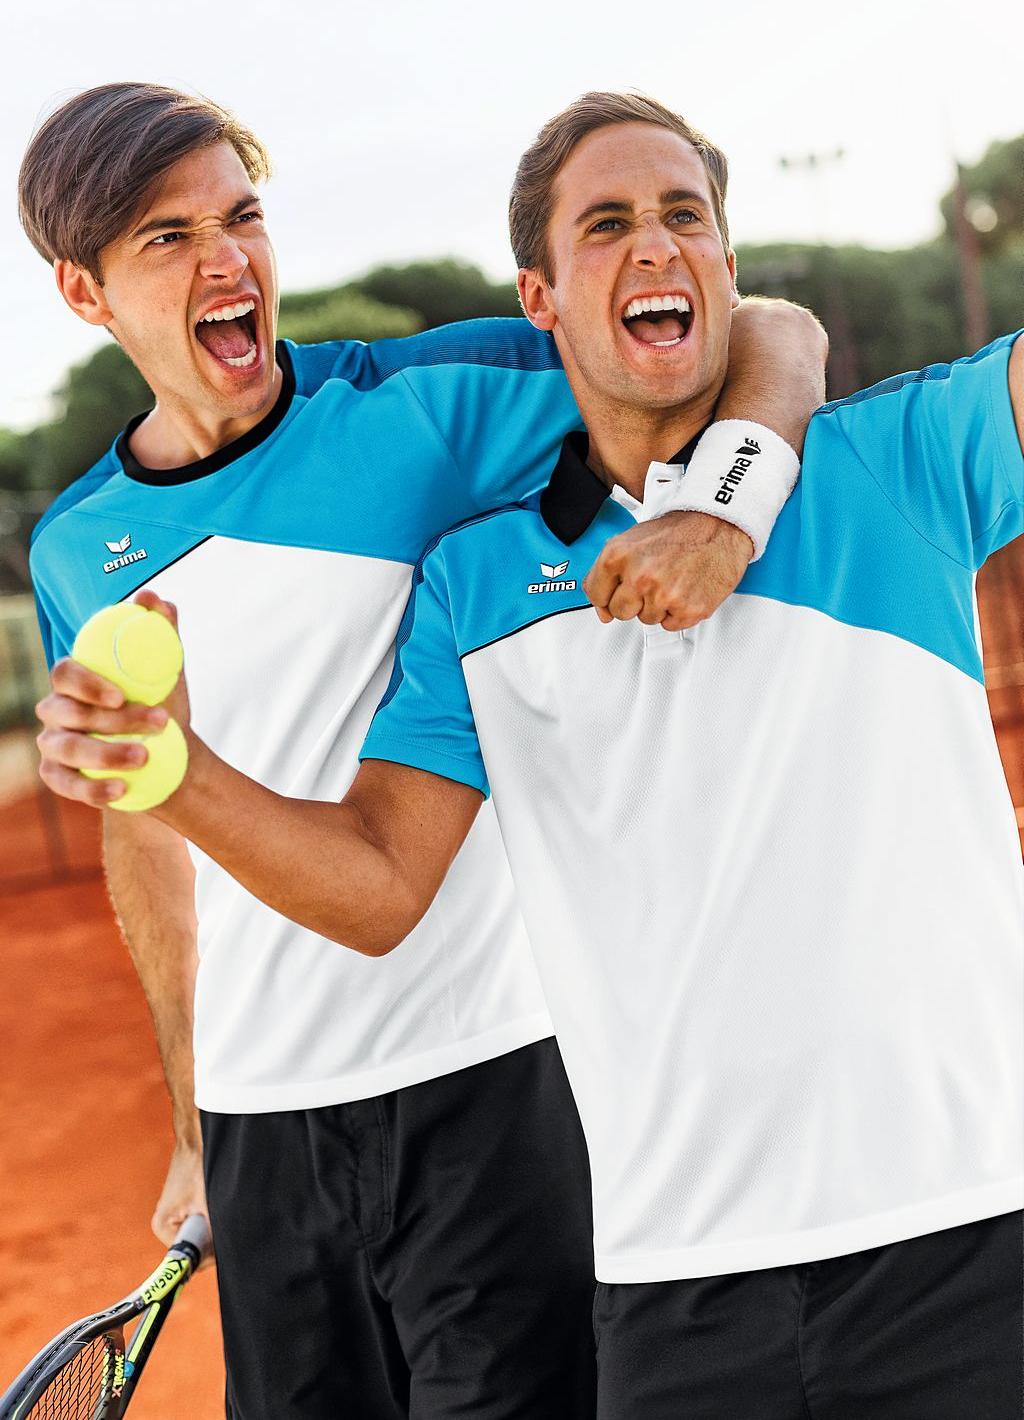 media/image/Tennis_6_mobil.jpg